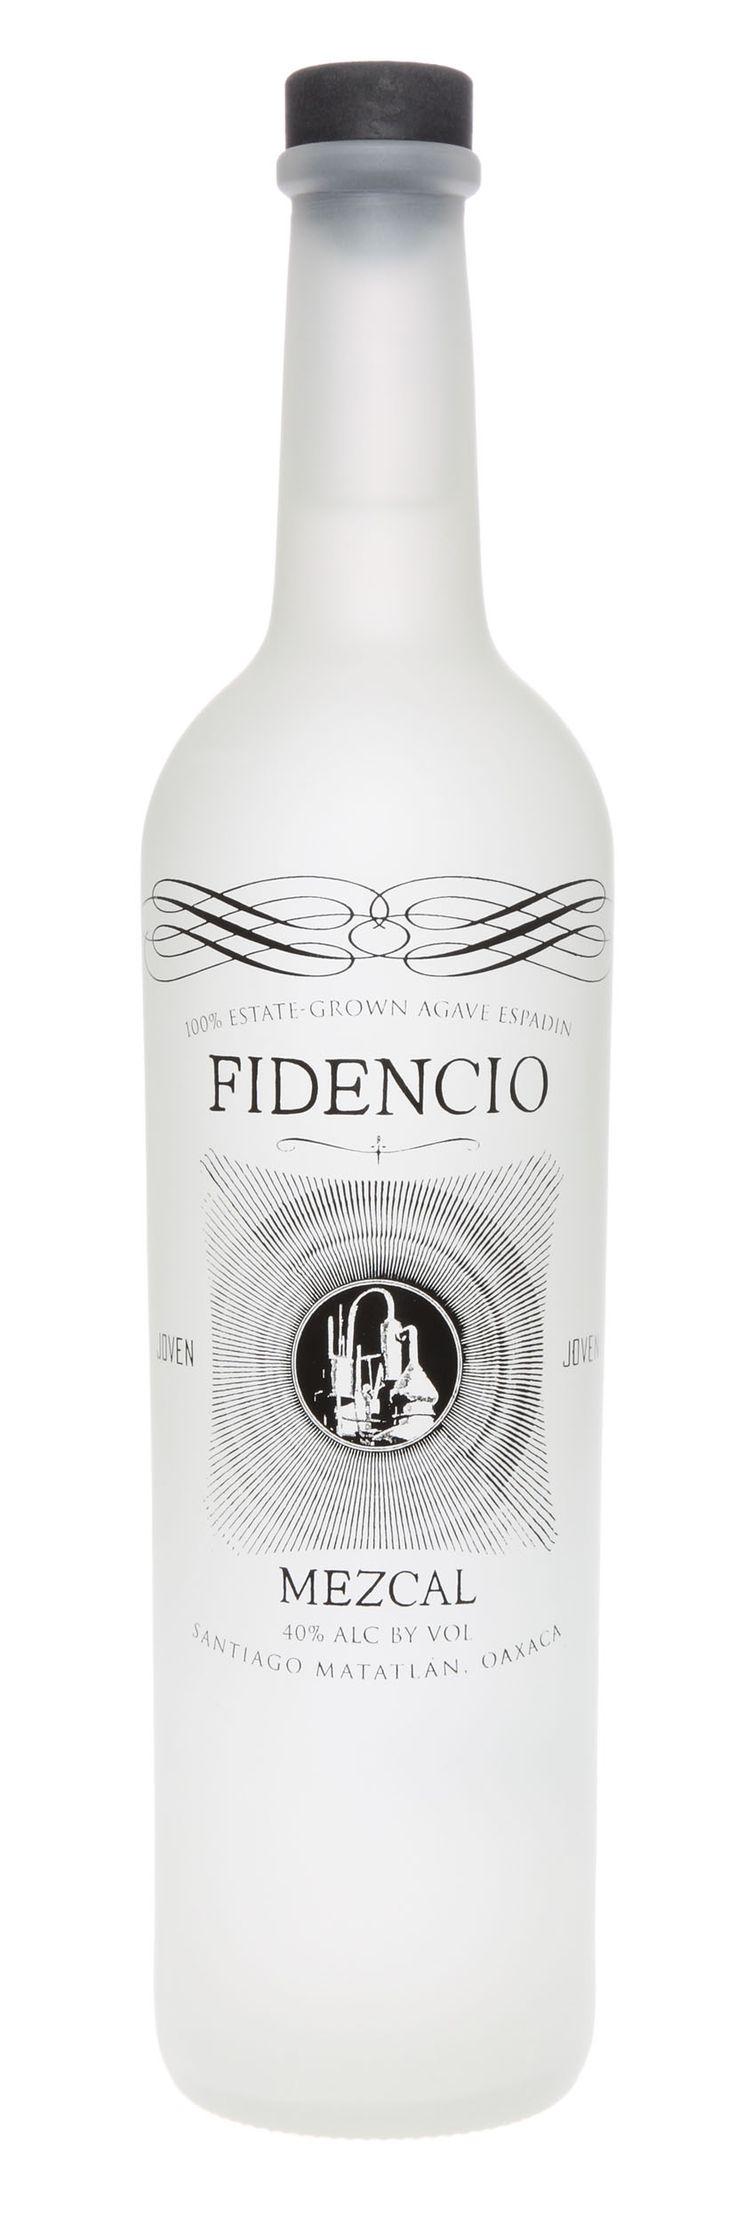 Fidencio Mezcal- Our Product